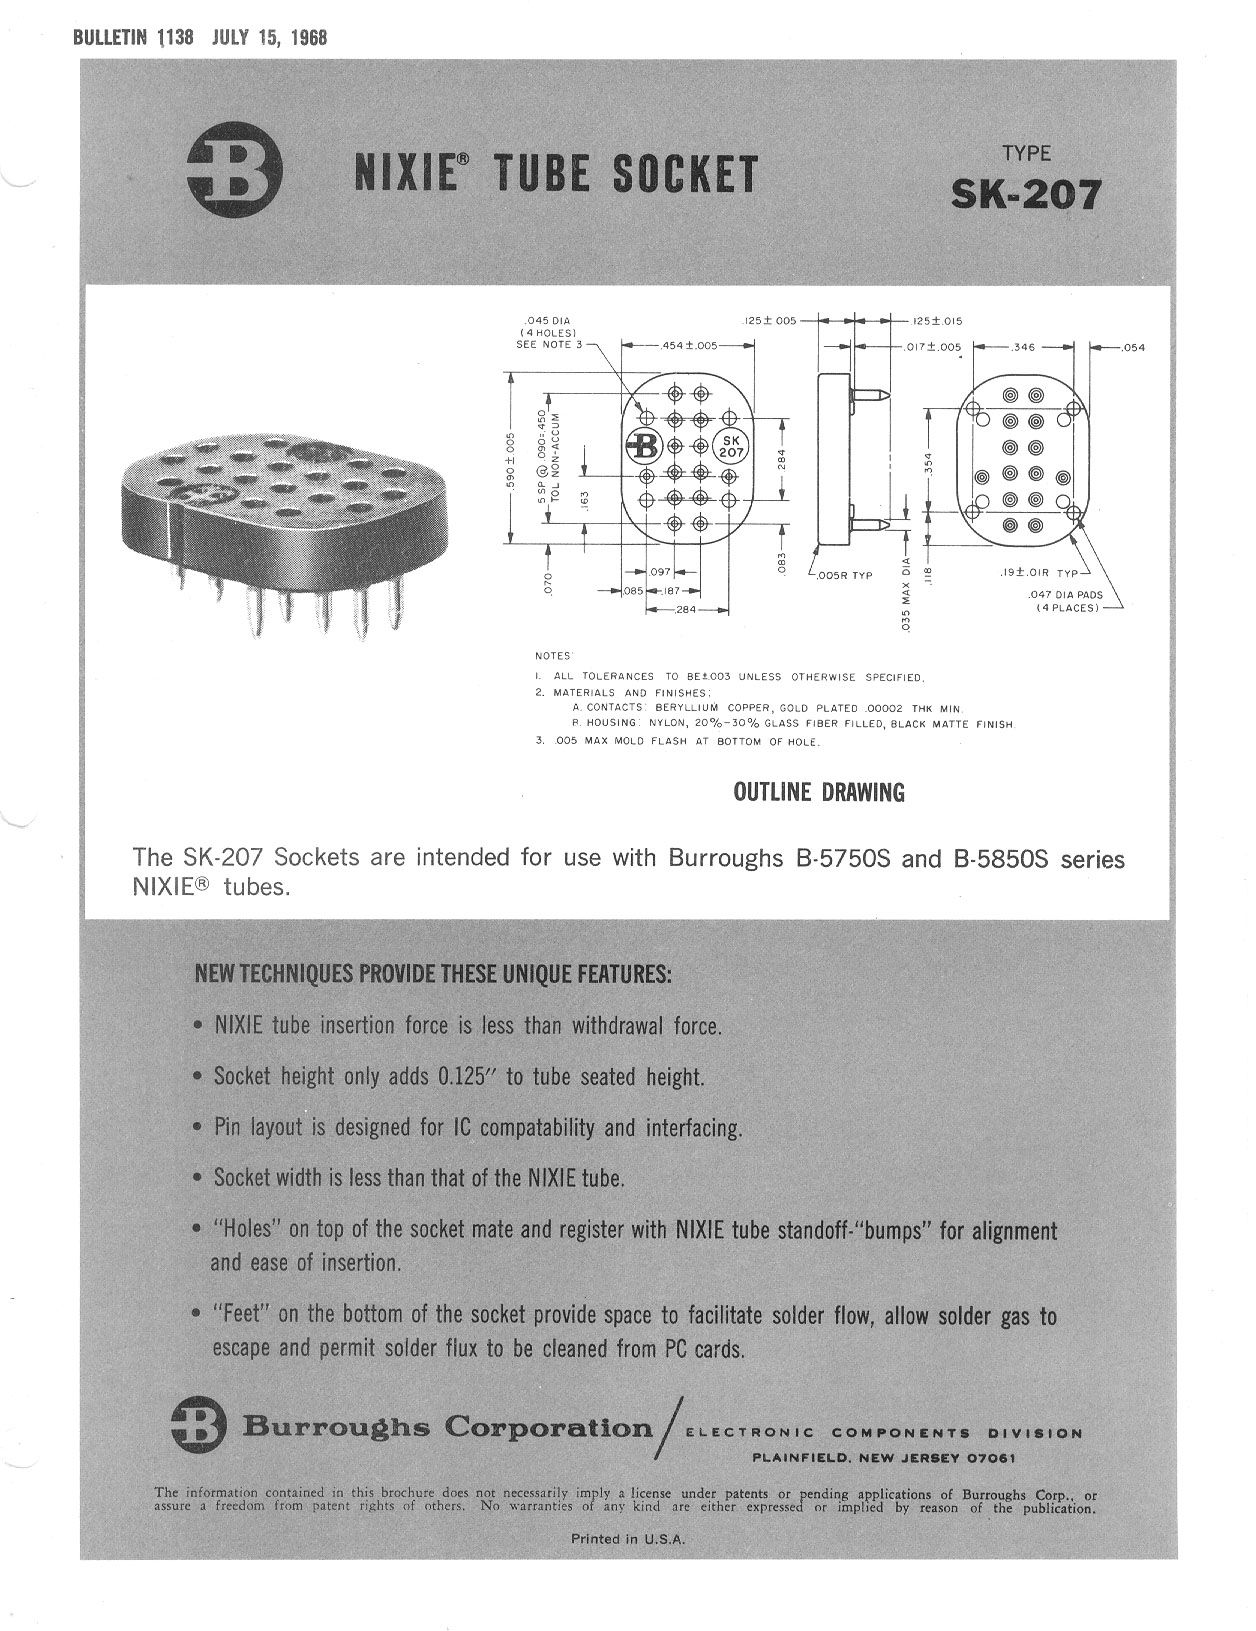 Nixie tube data from Cathode Corner